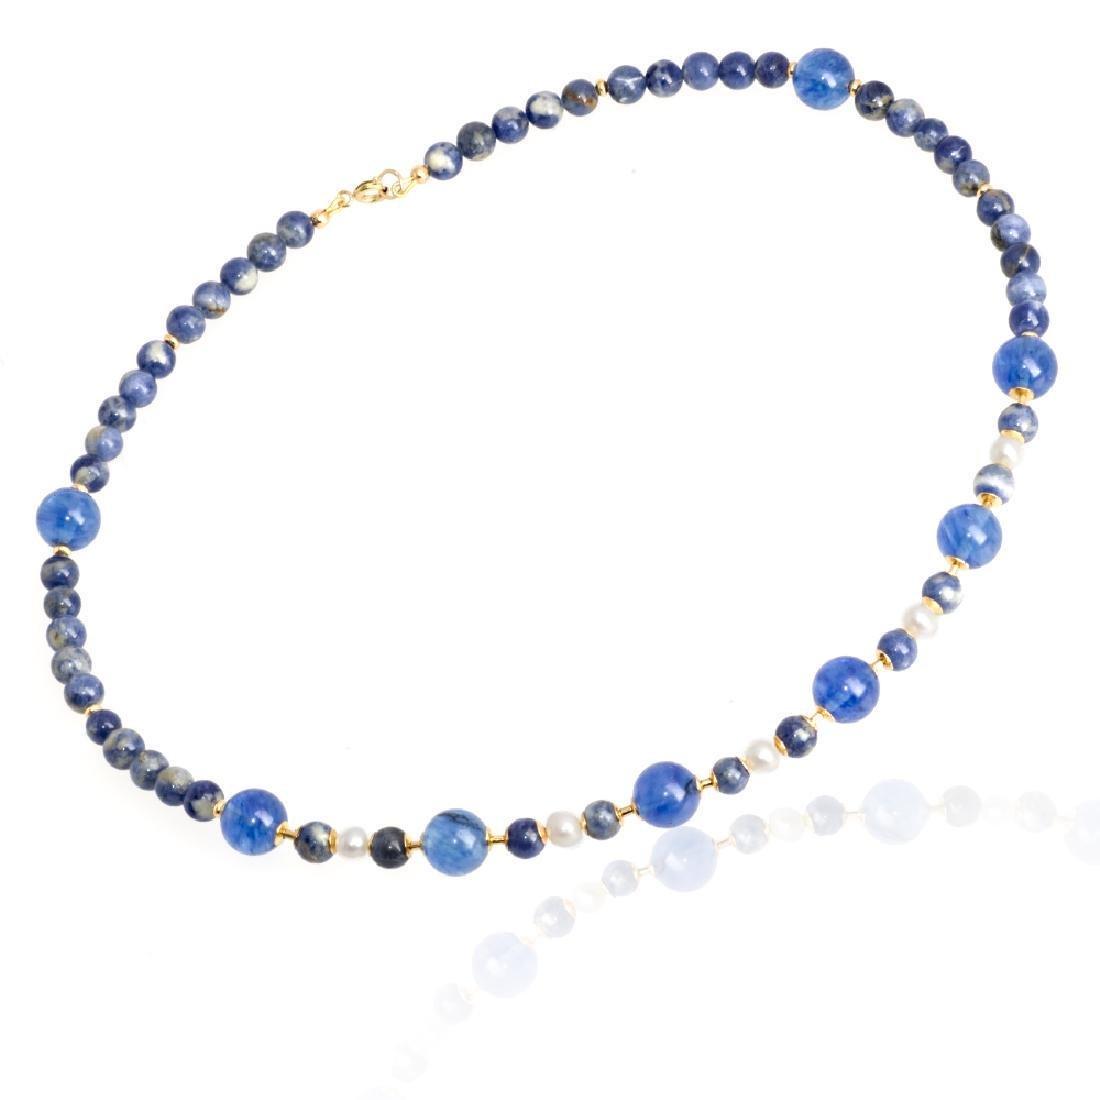 Sodalite and Capri quartz necklace with Pearls - 2